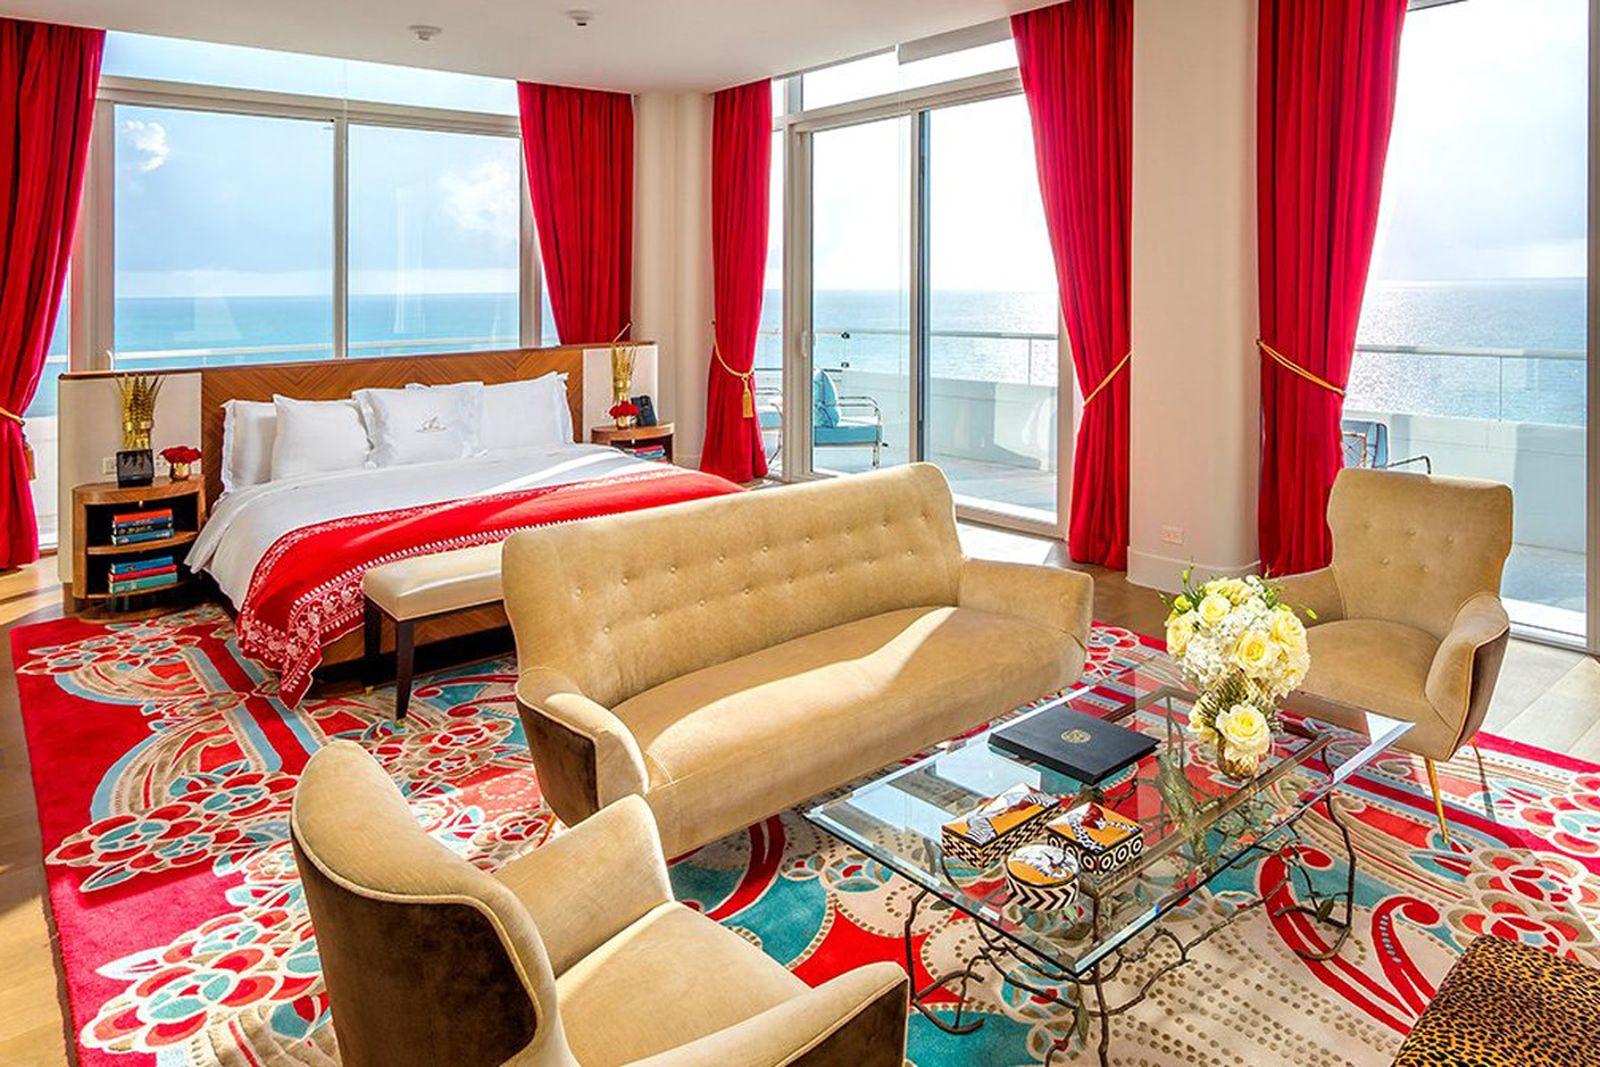 Faena Penthouse 04 hotels plaza hotel the palms